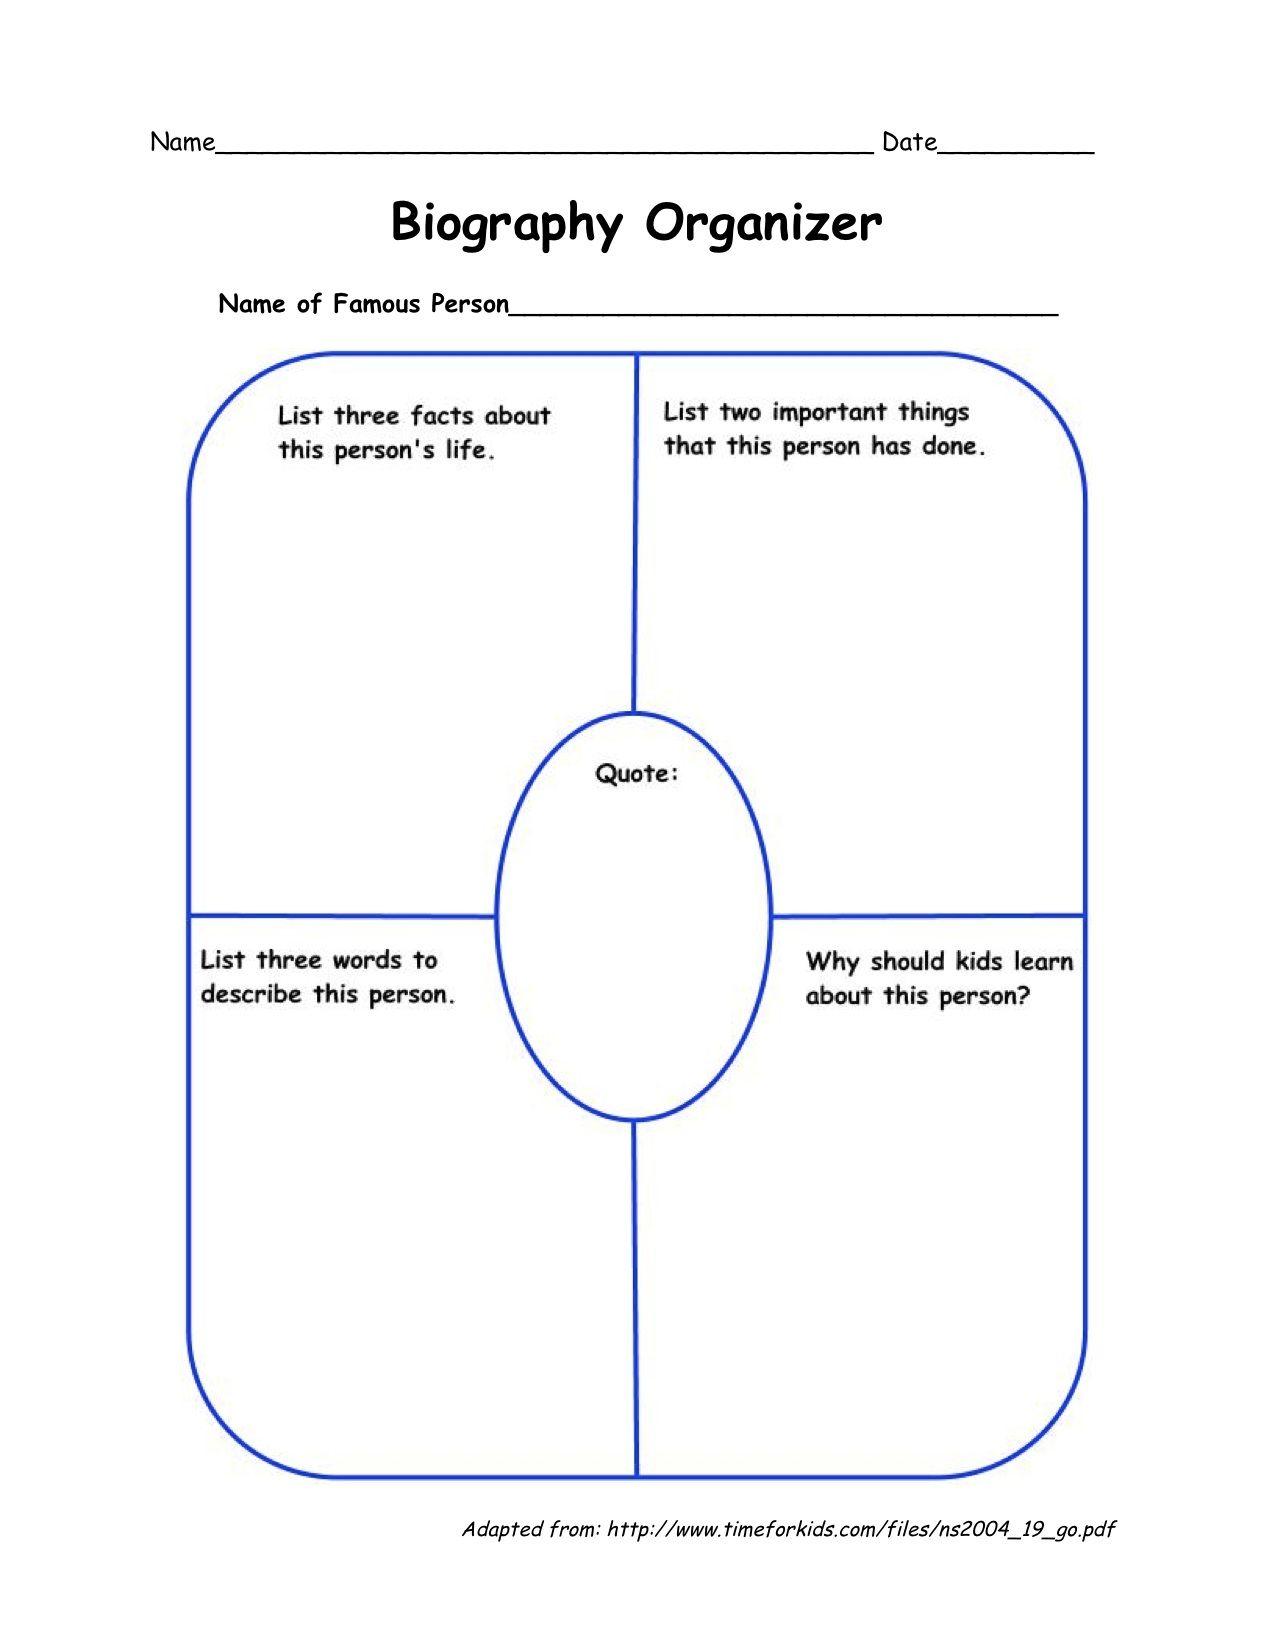 medium resolution of templatebiographyorganizer-1.jpg (1275×1651)   Second grade writing